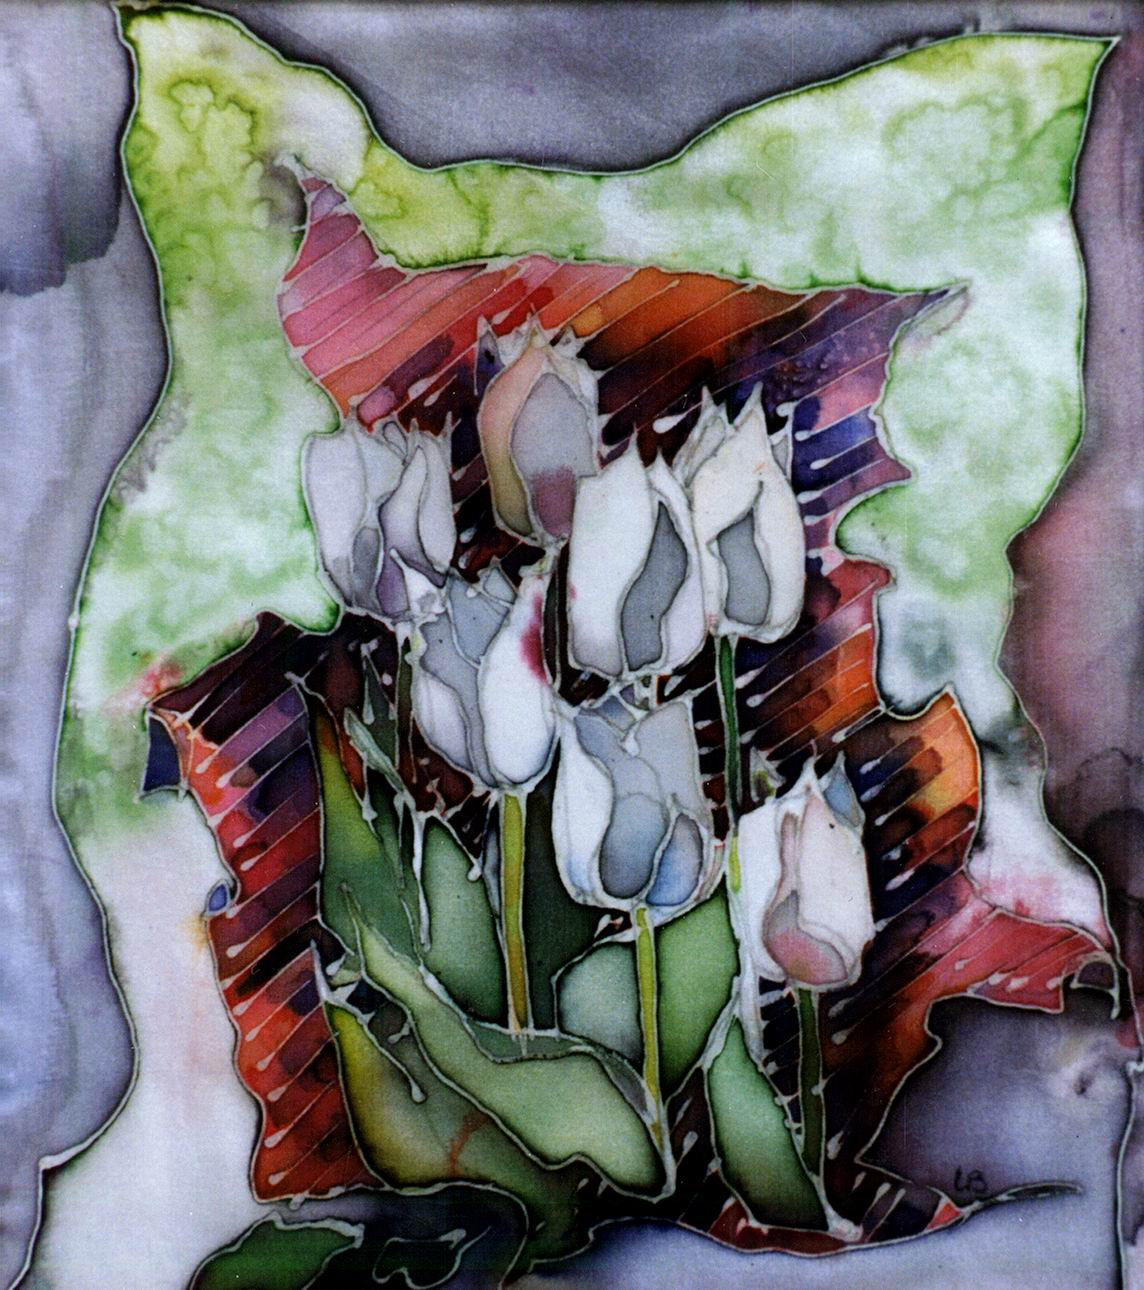 002 - Witte Tulp